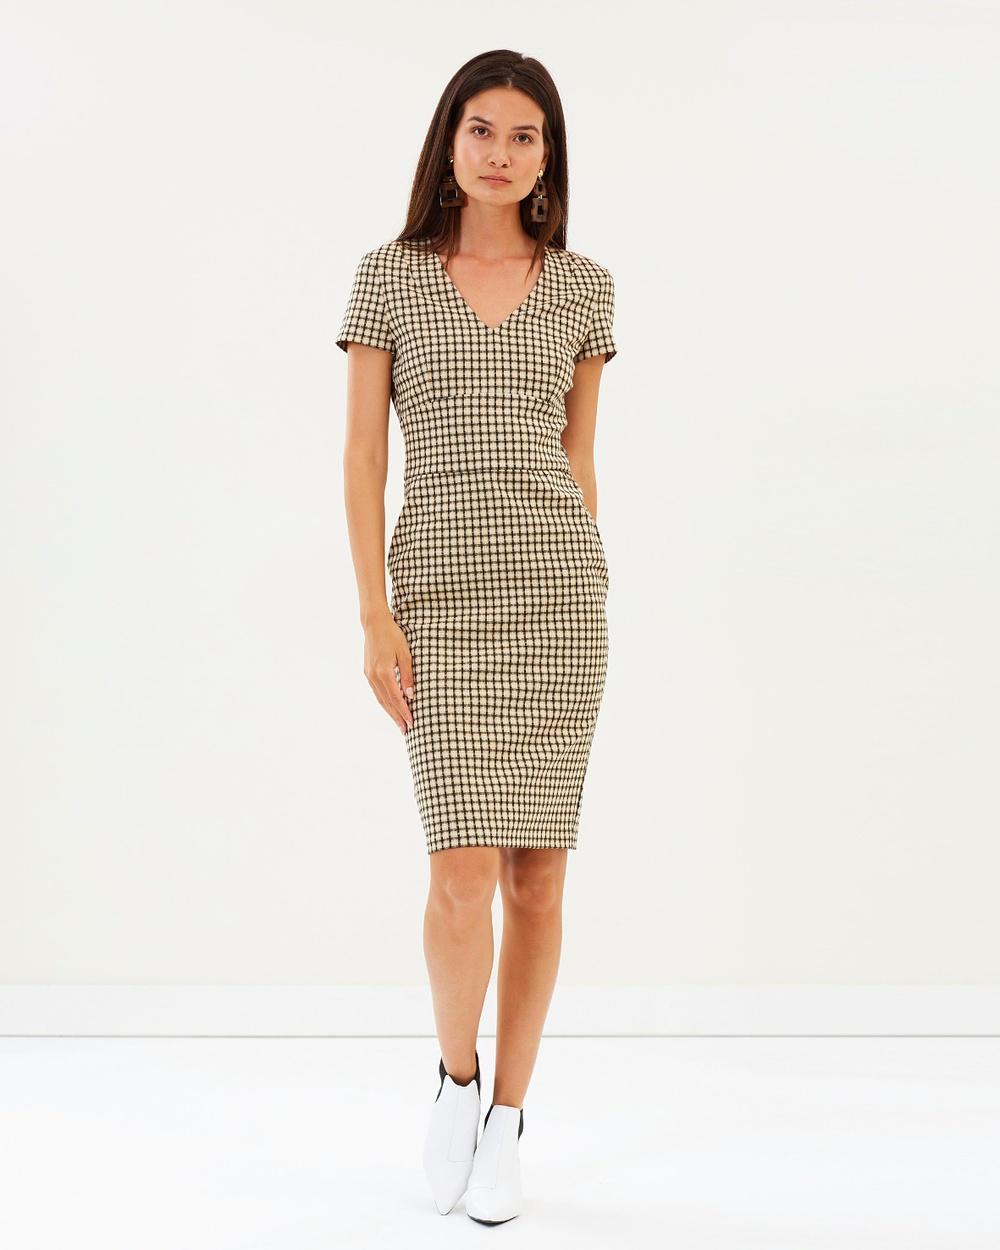 M.N.G Gales Dress Dresses Crudo Gales Dress